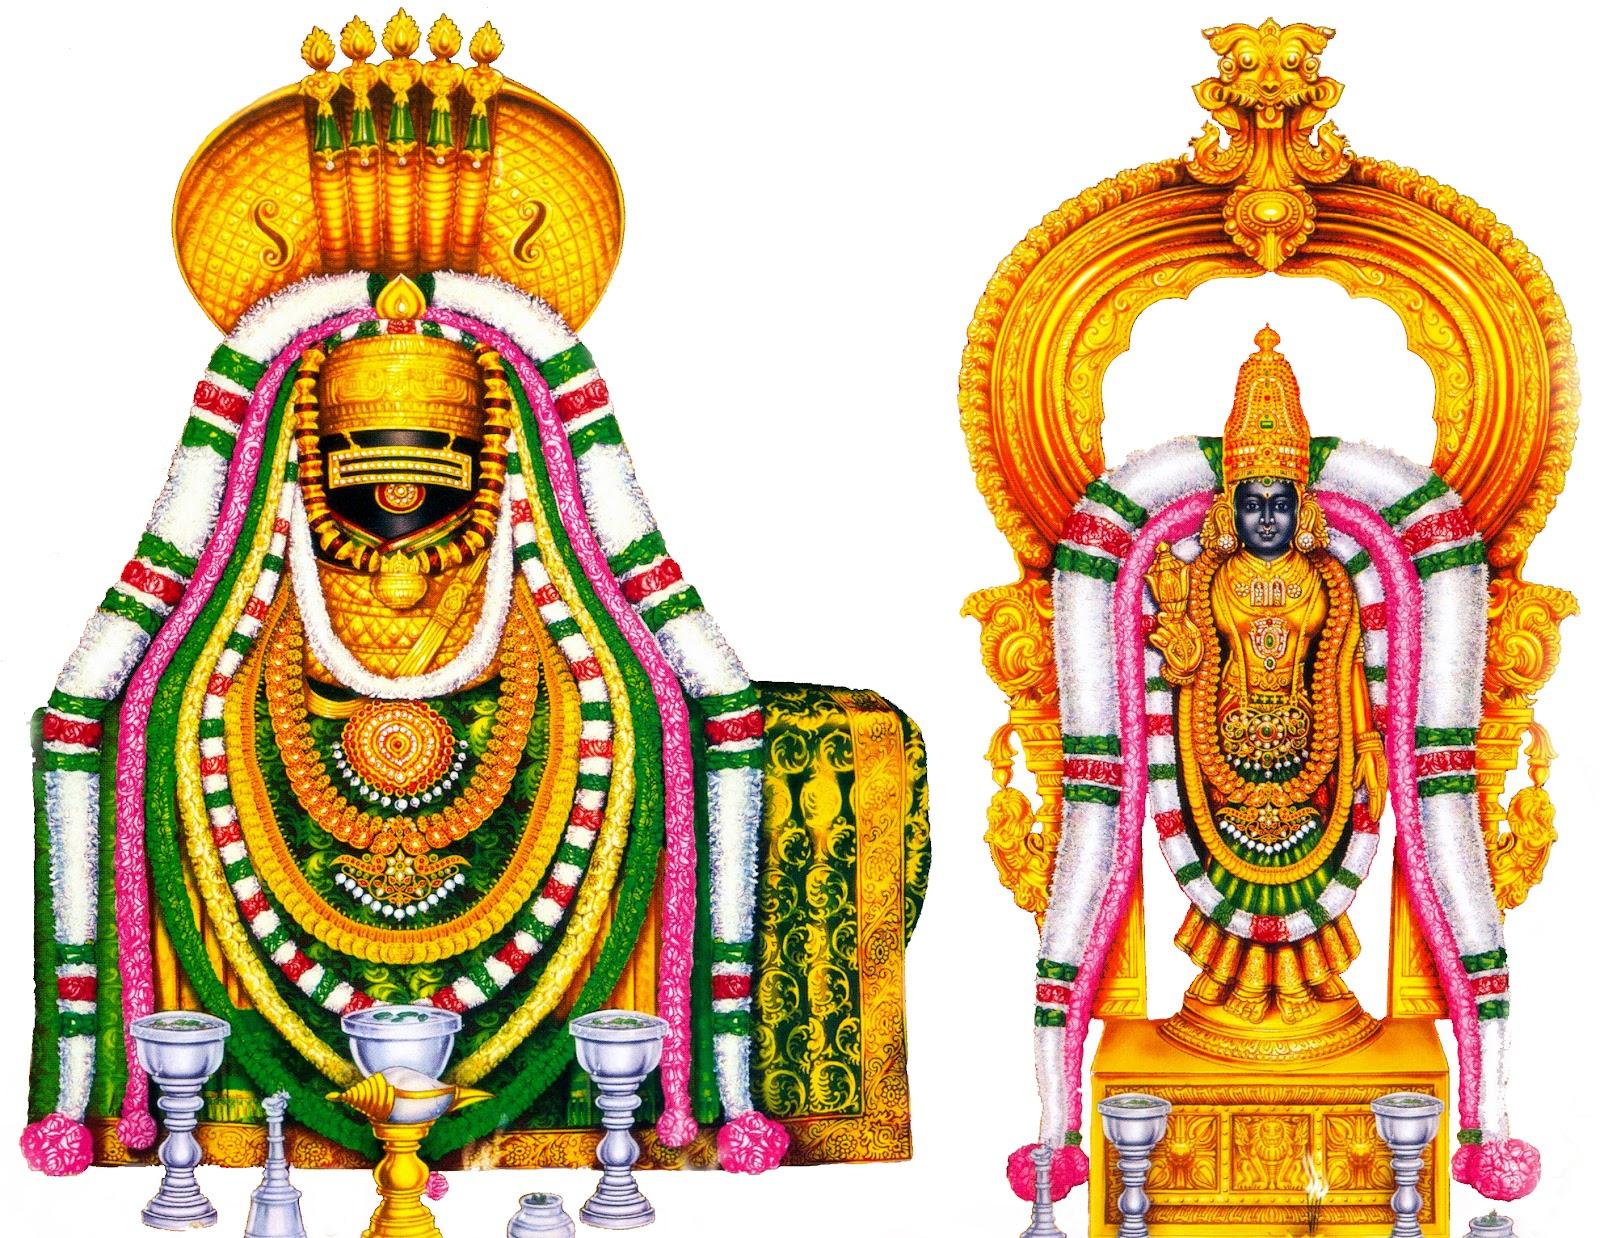 Annamalaiyar Temple, Tiruvannamalai (Fire)